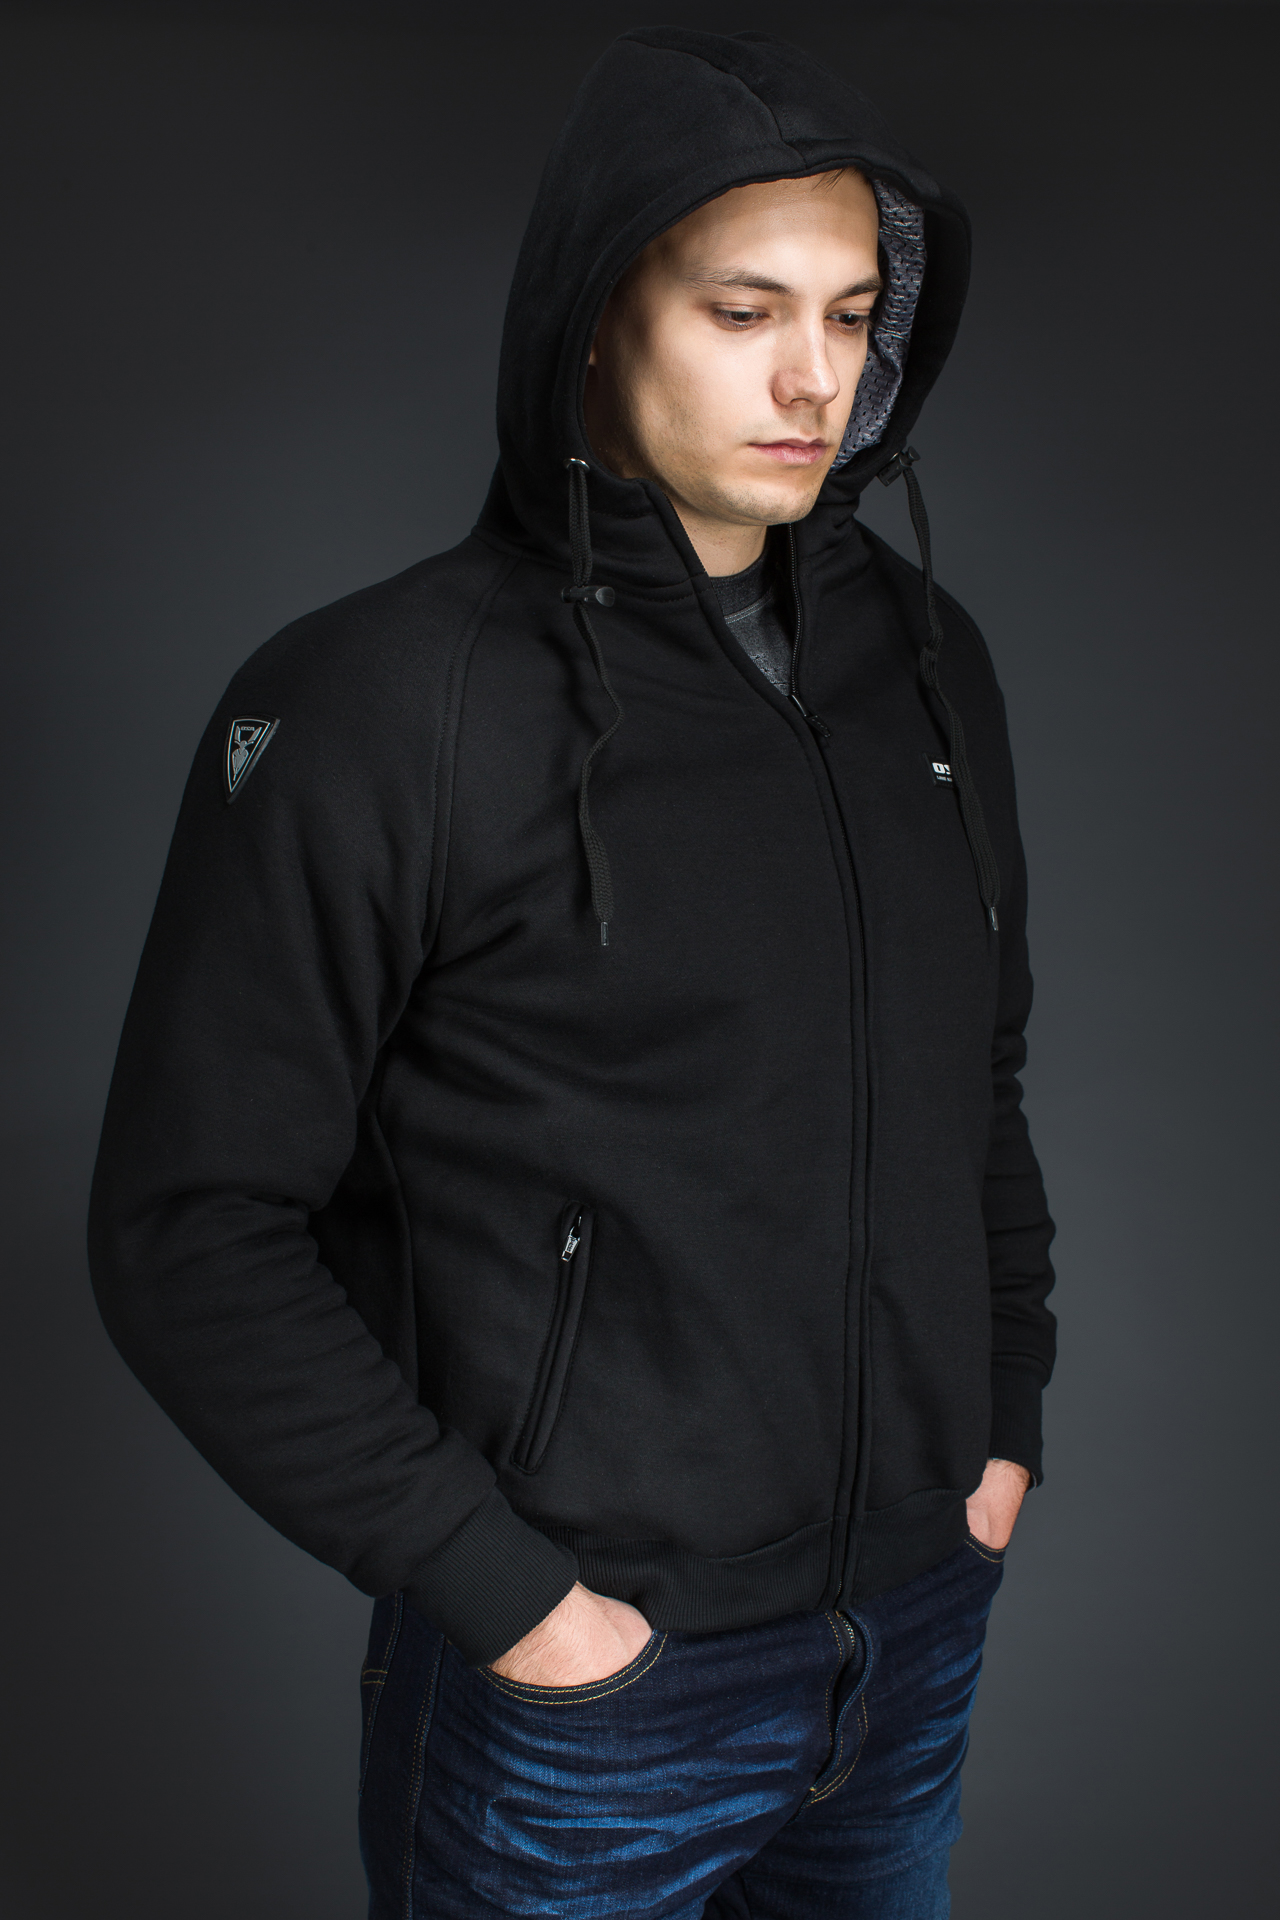 Streetfire hoodie